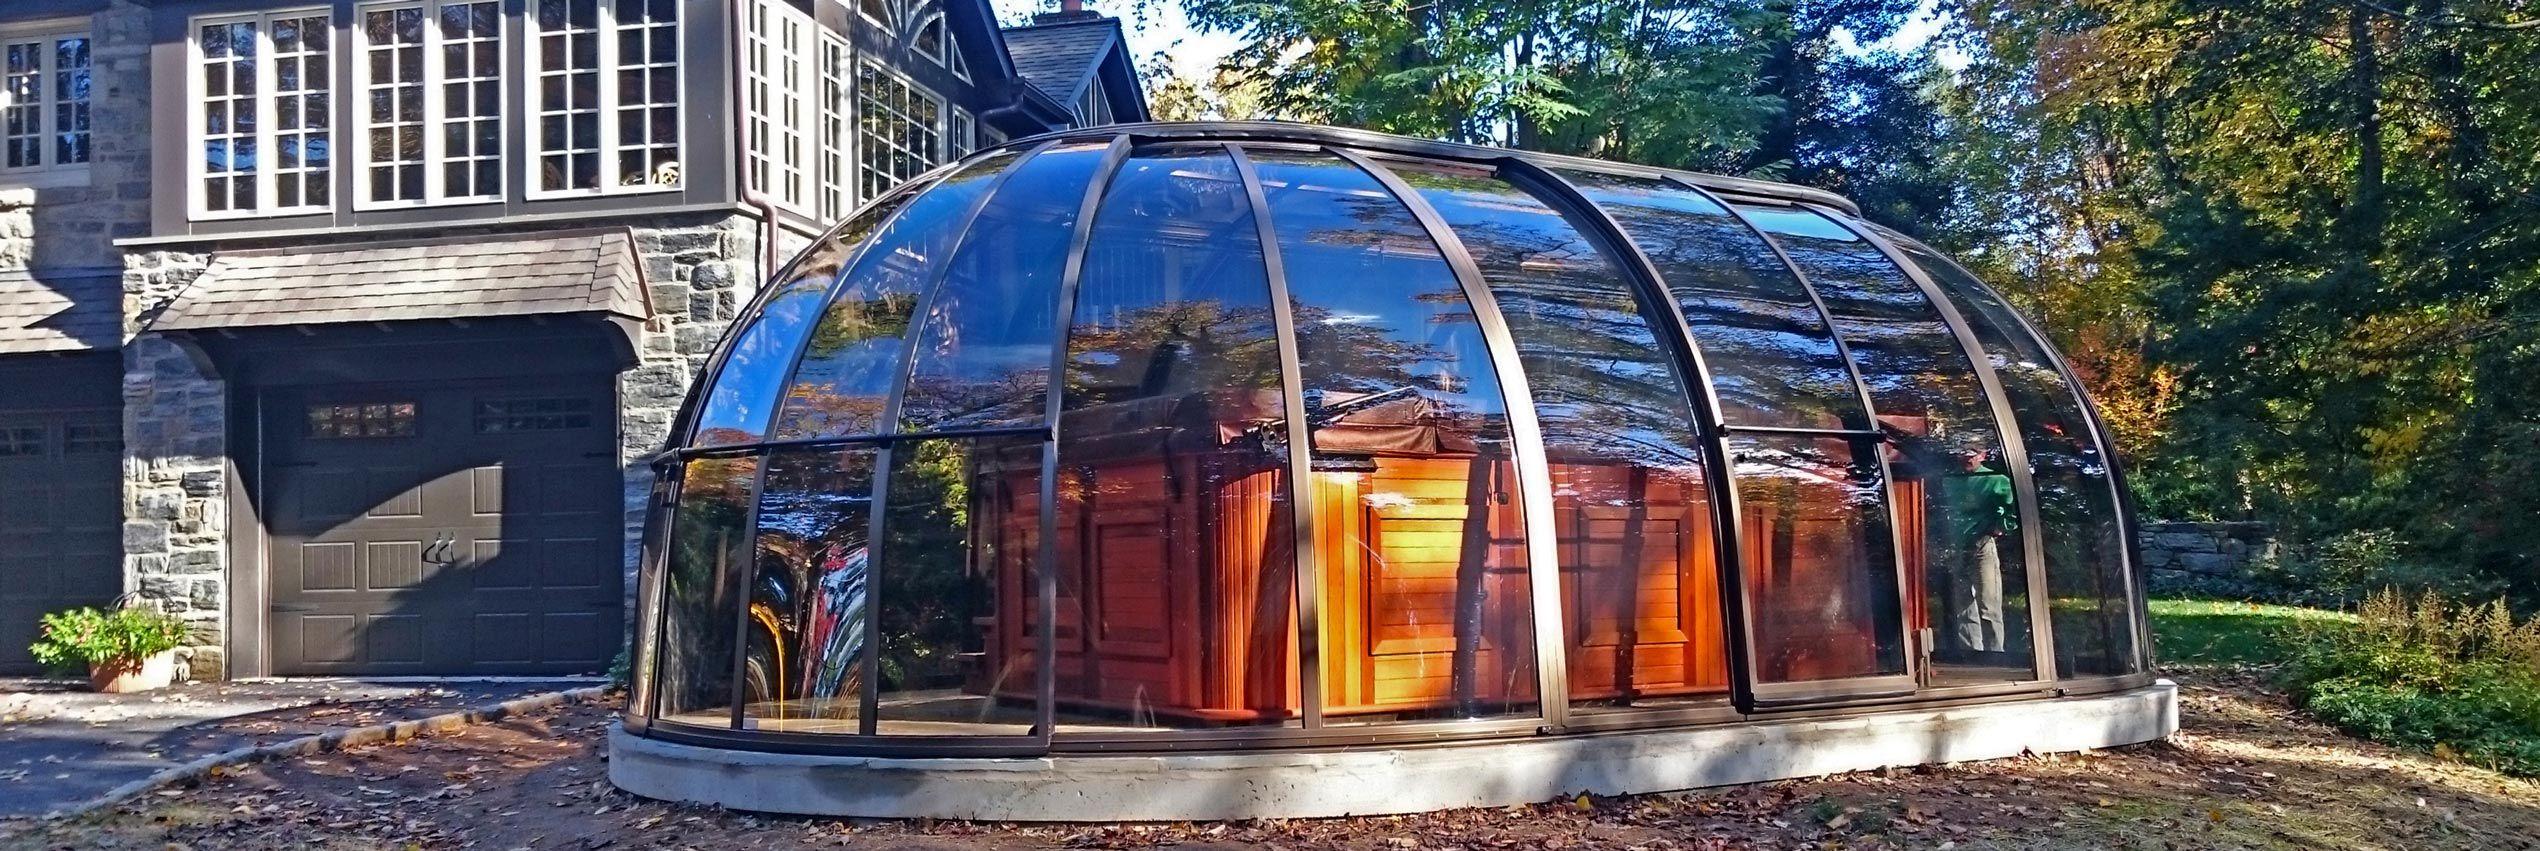 Aufgeschobene Spaüberdachung SPA Sunhouse